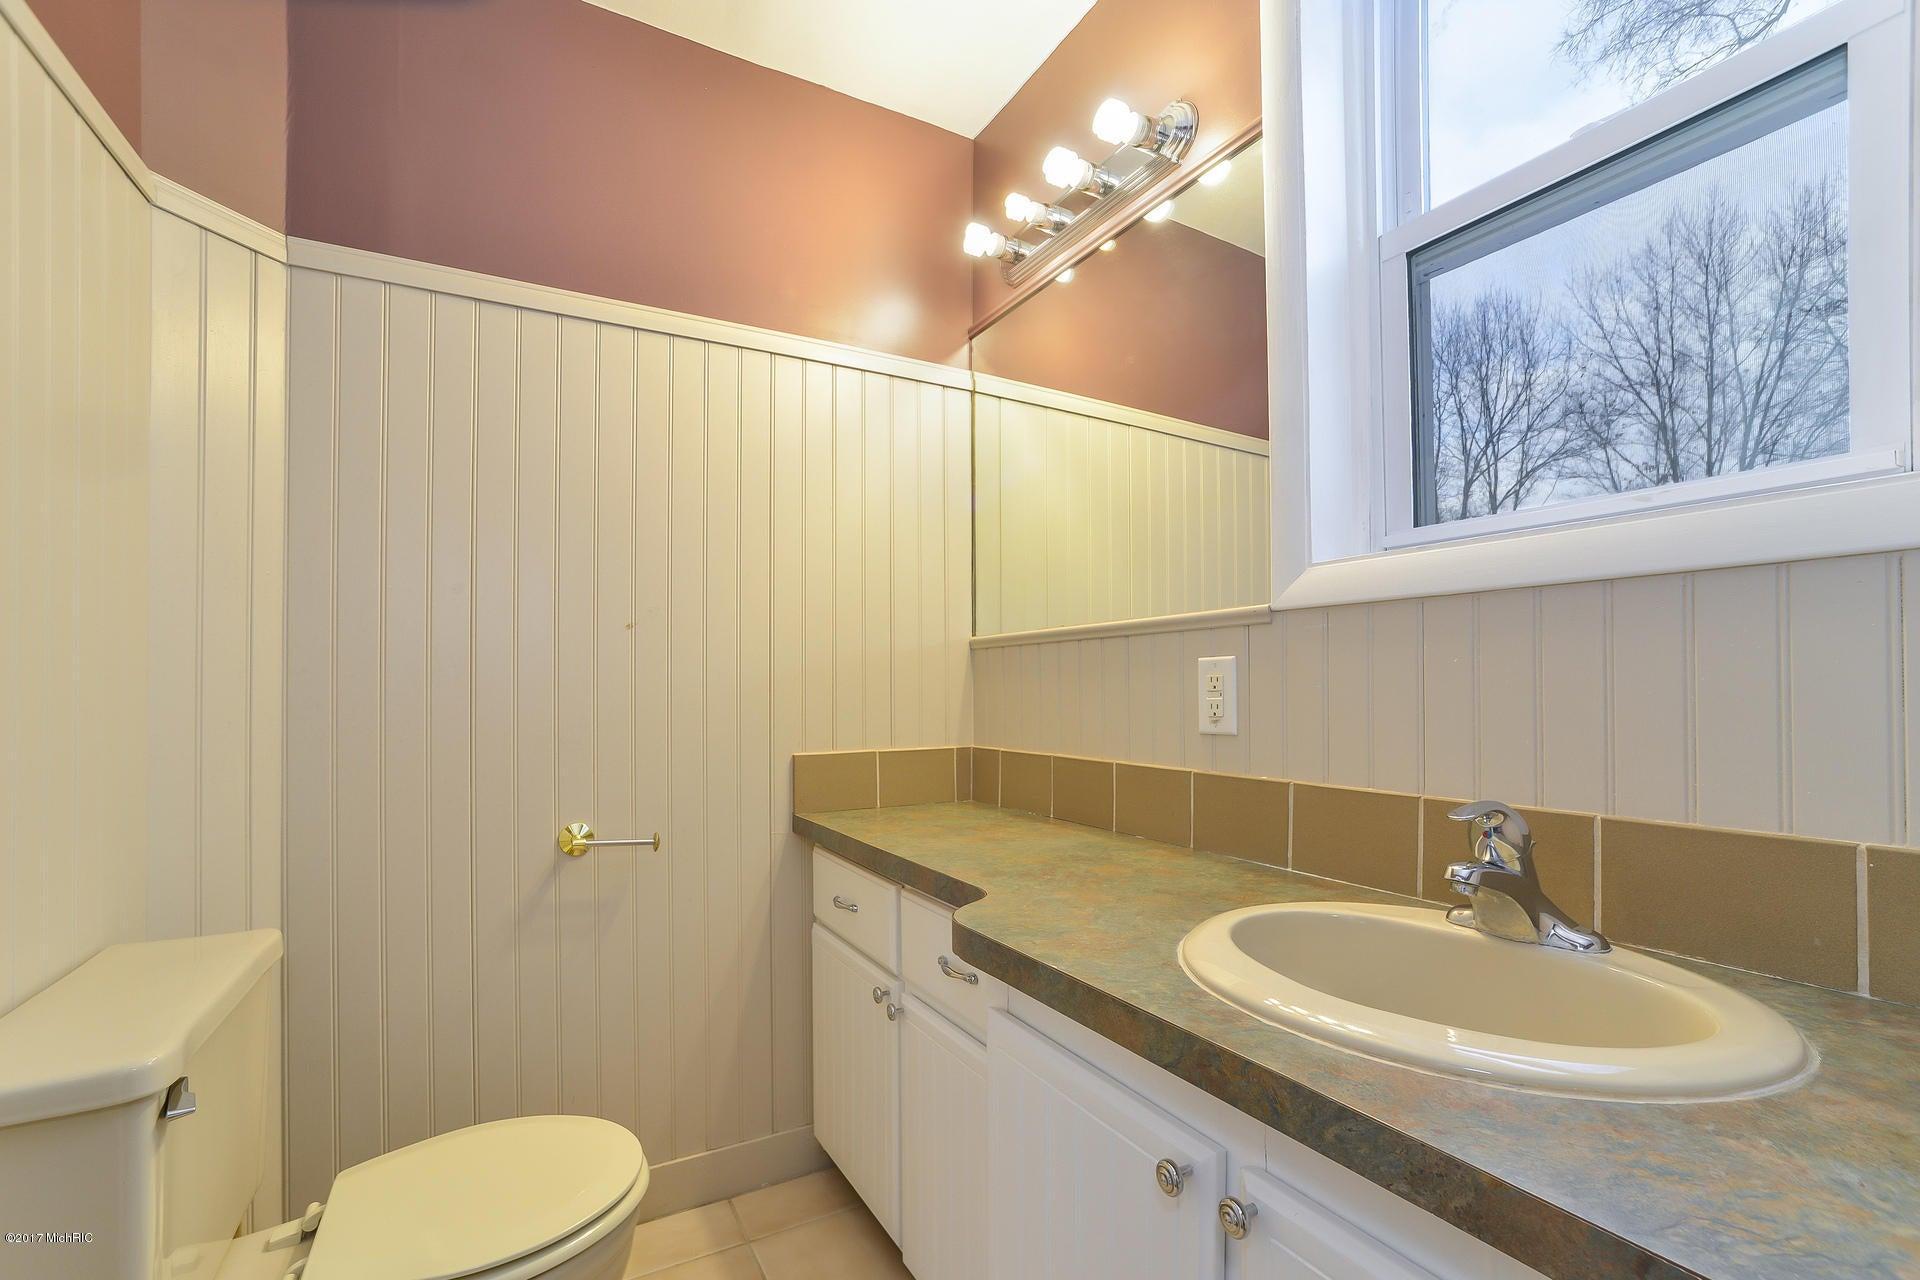 019-Main Bathroom-3668430-medium